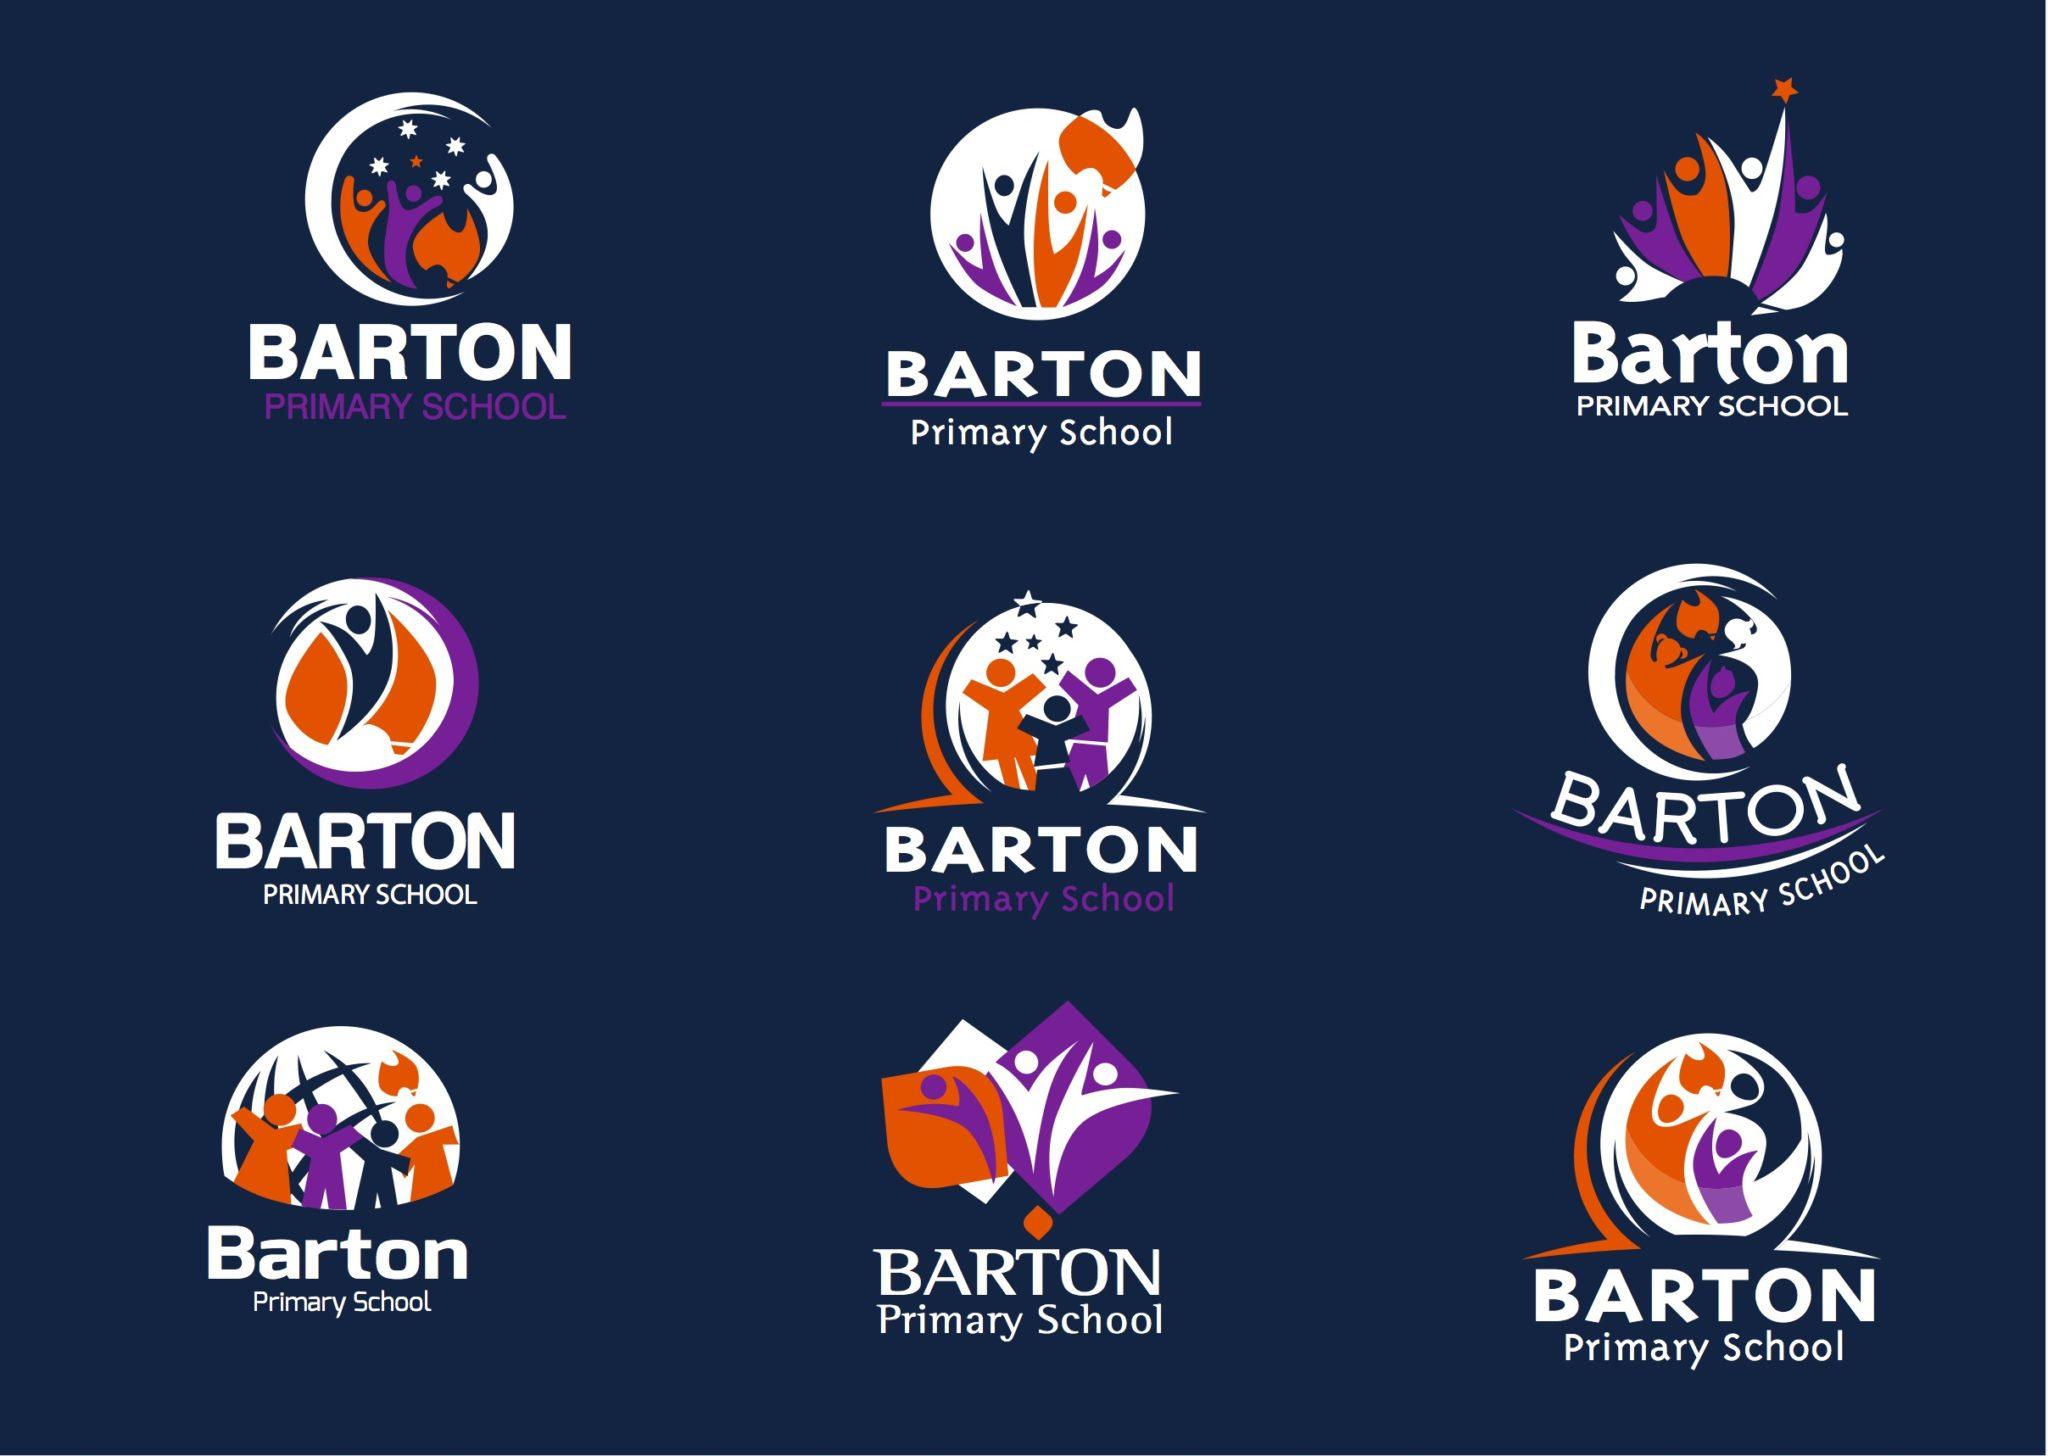 School Branding and Logos